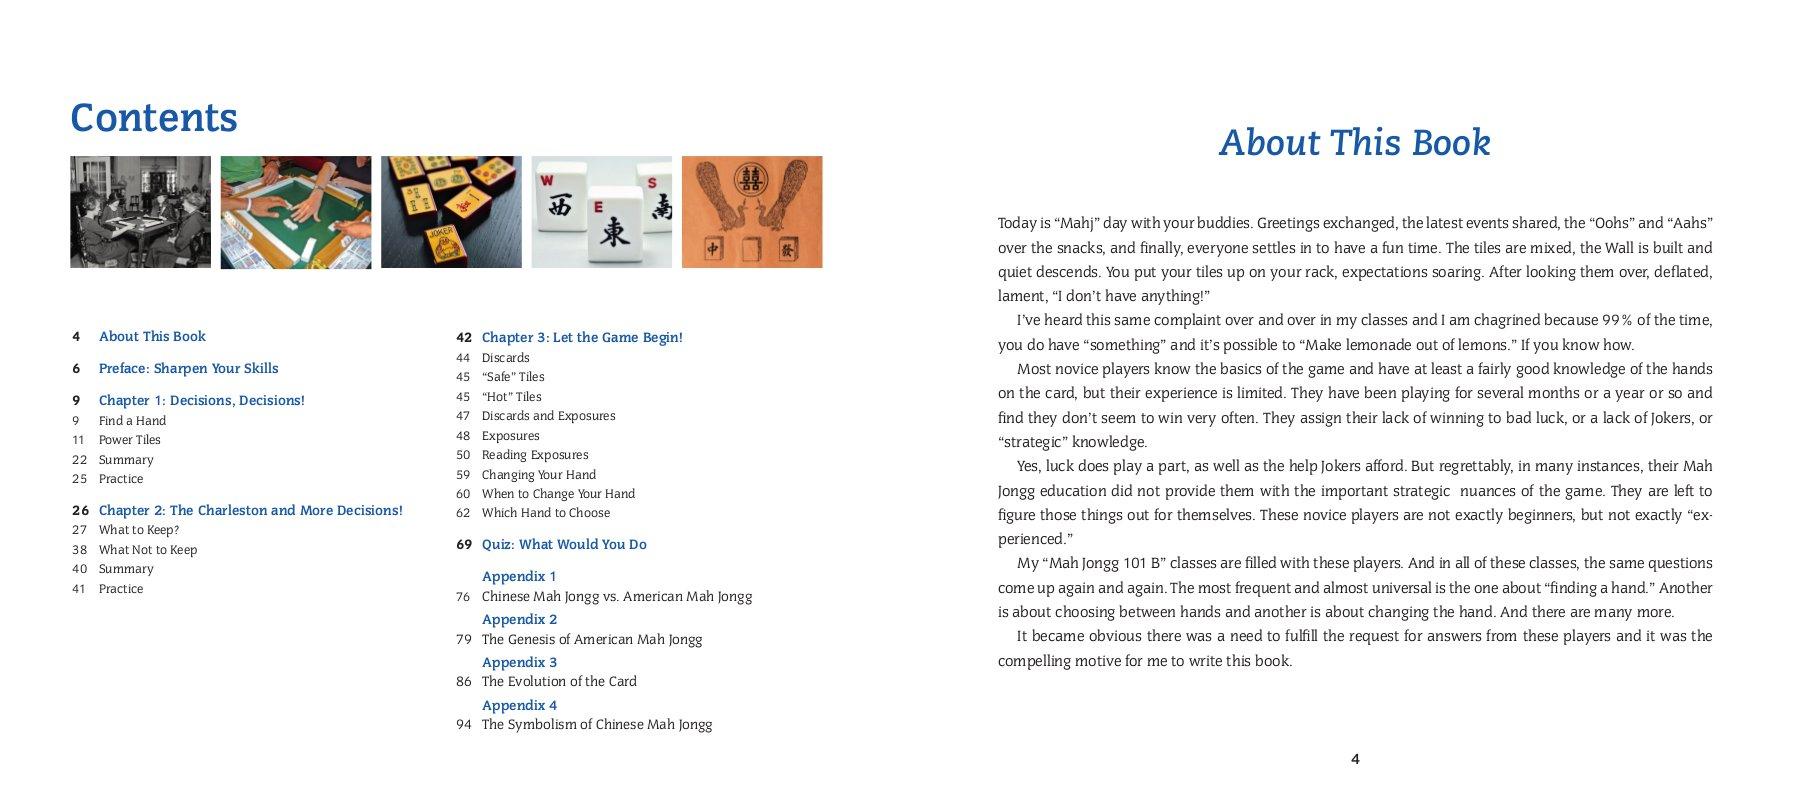 Winning American Mah Jongg Strategies: A Guide for the